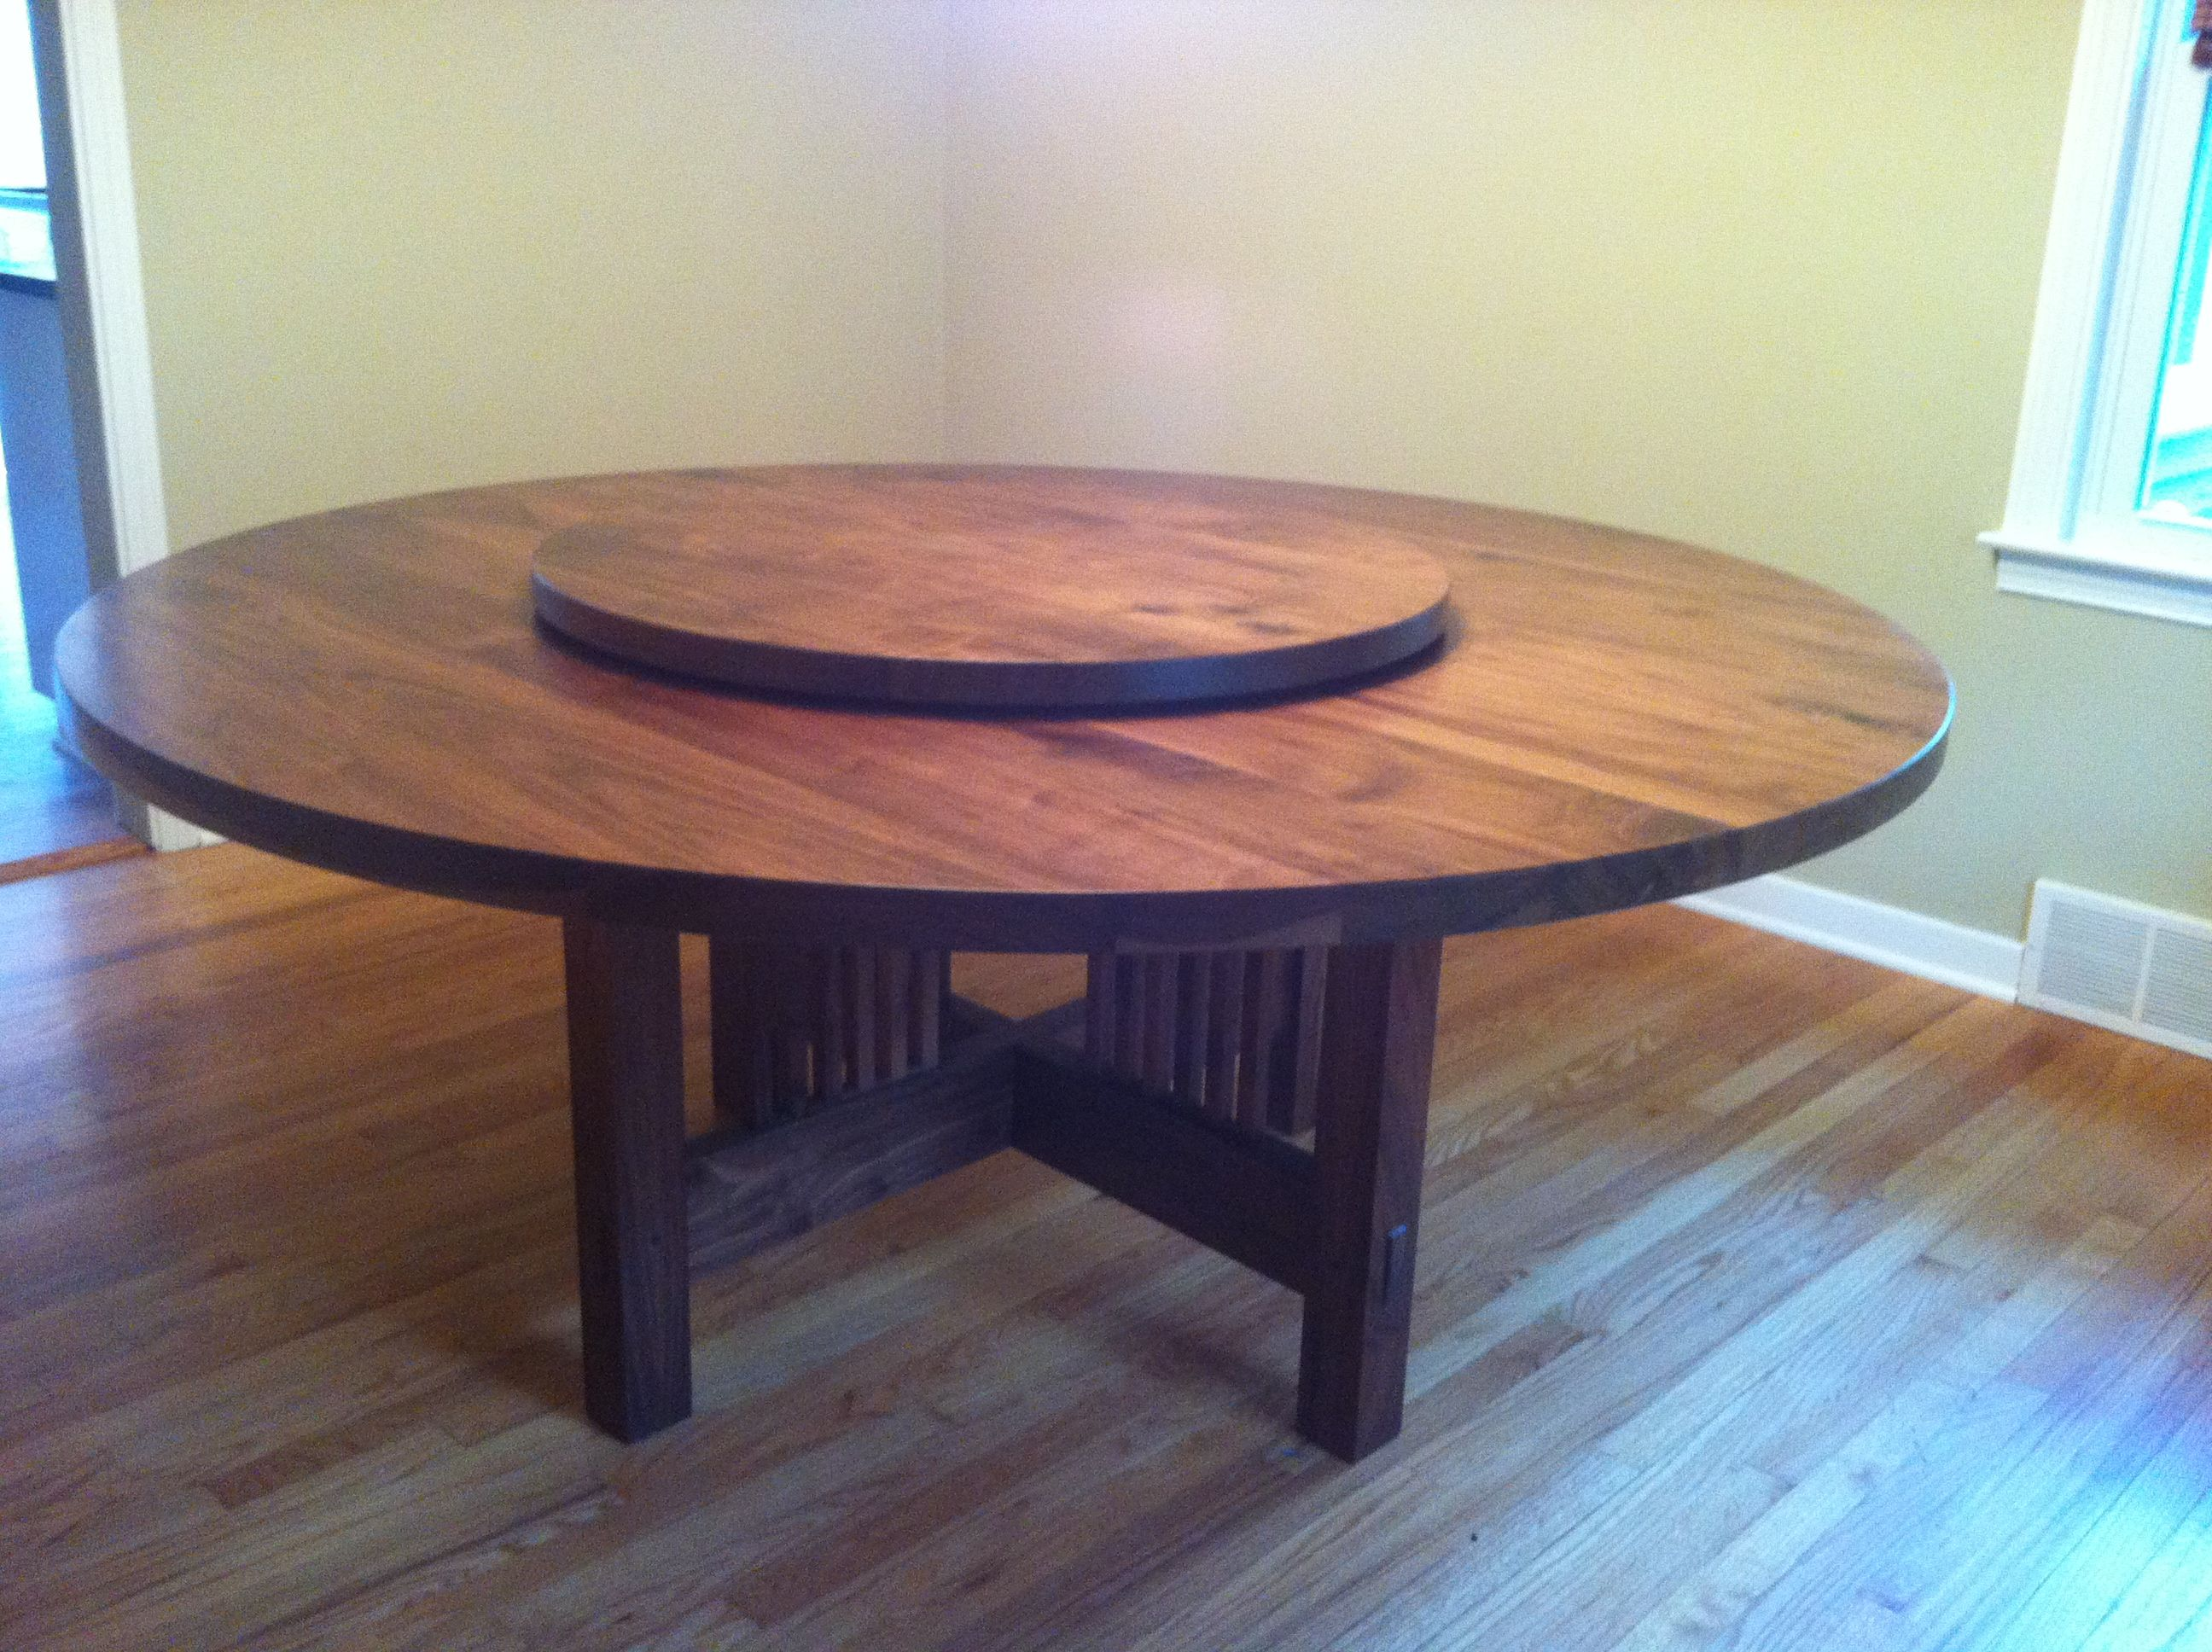 Bohlender Line Luxury Kitchen Decor Dinning Room Tables Kitchen Cabinets Decor